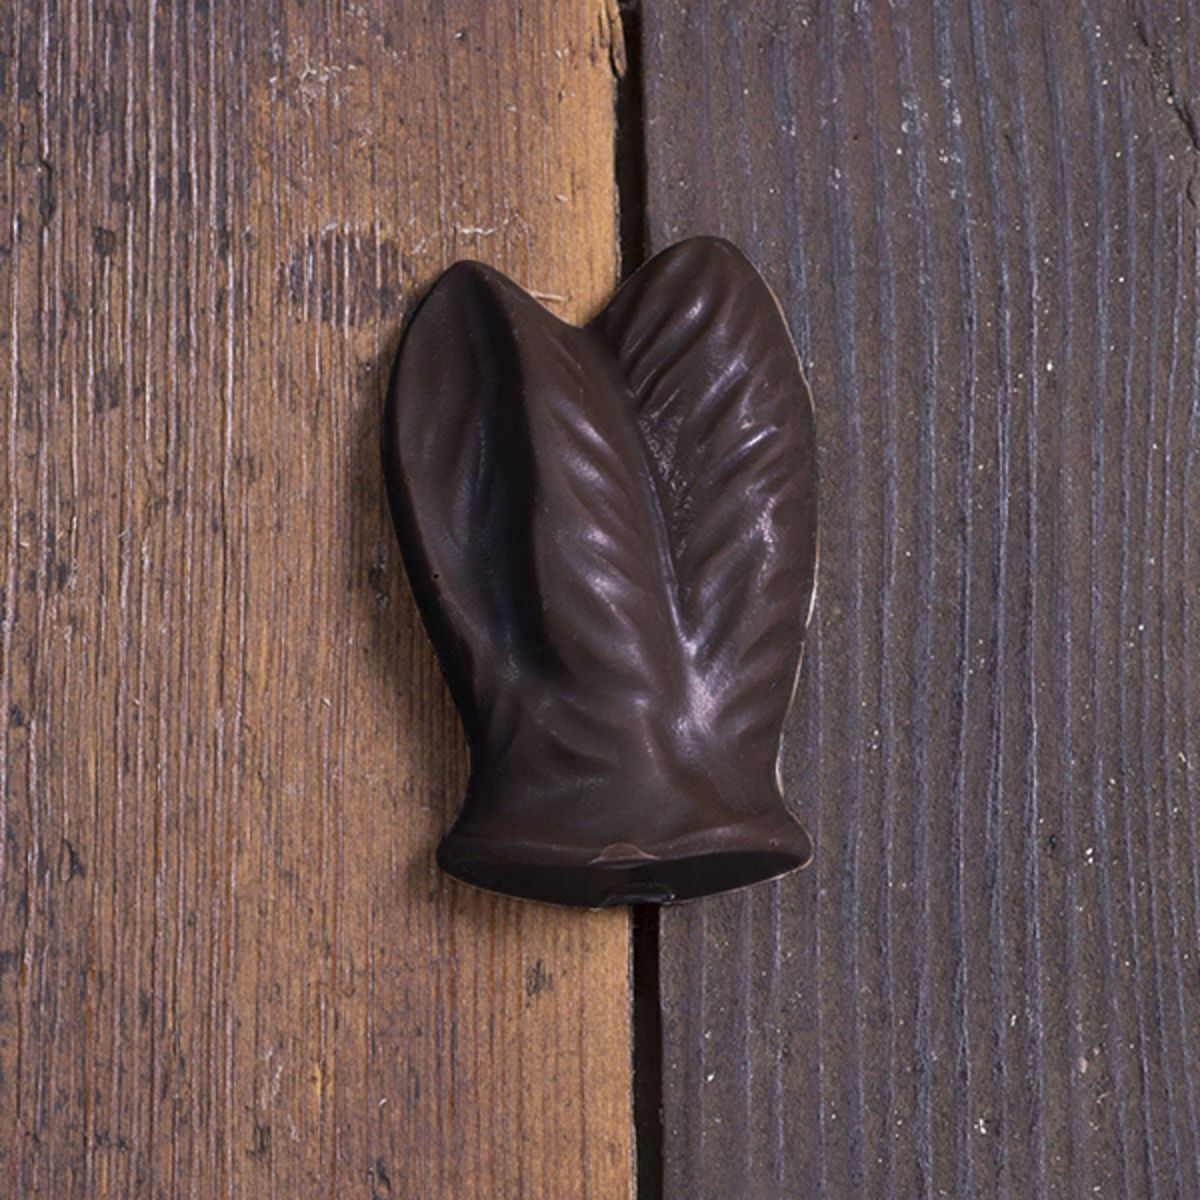 Dark Chocolate Bunny Ears